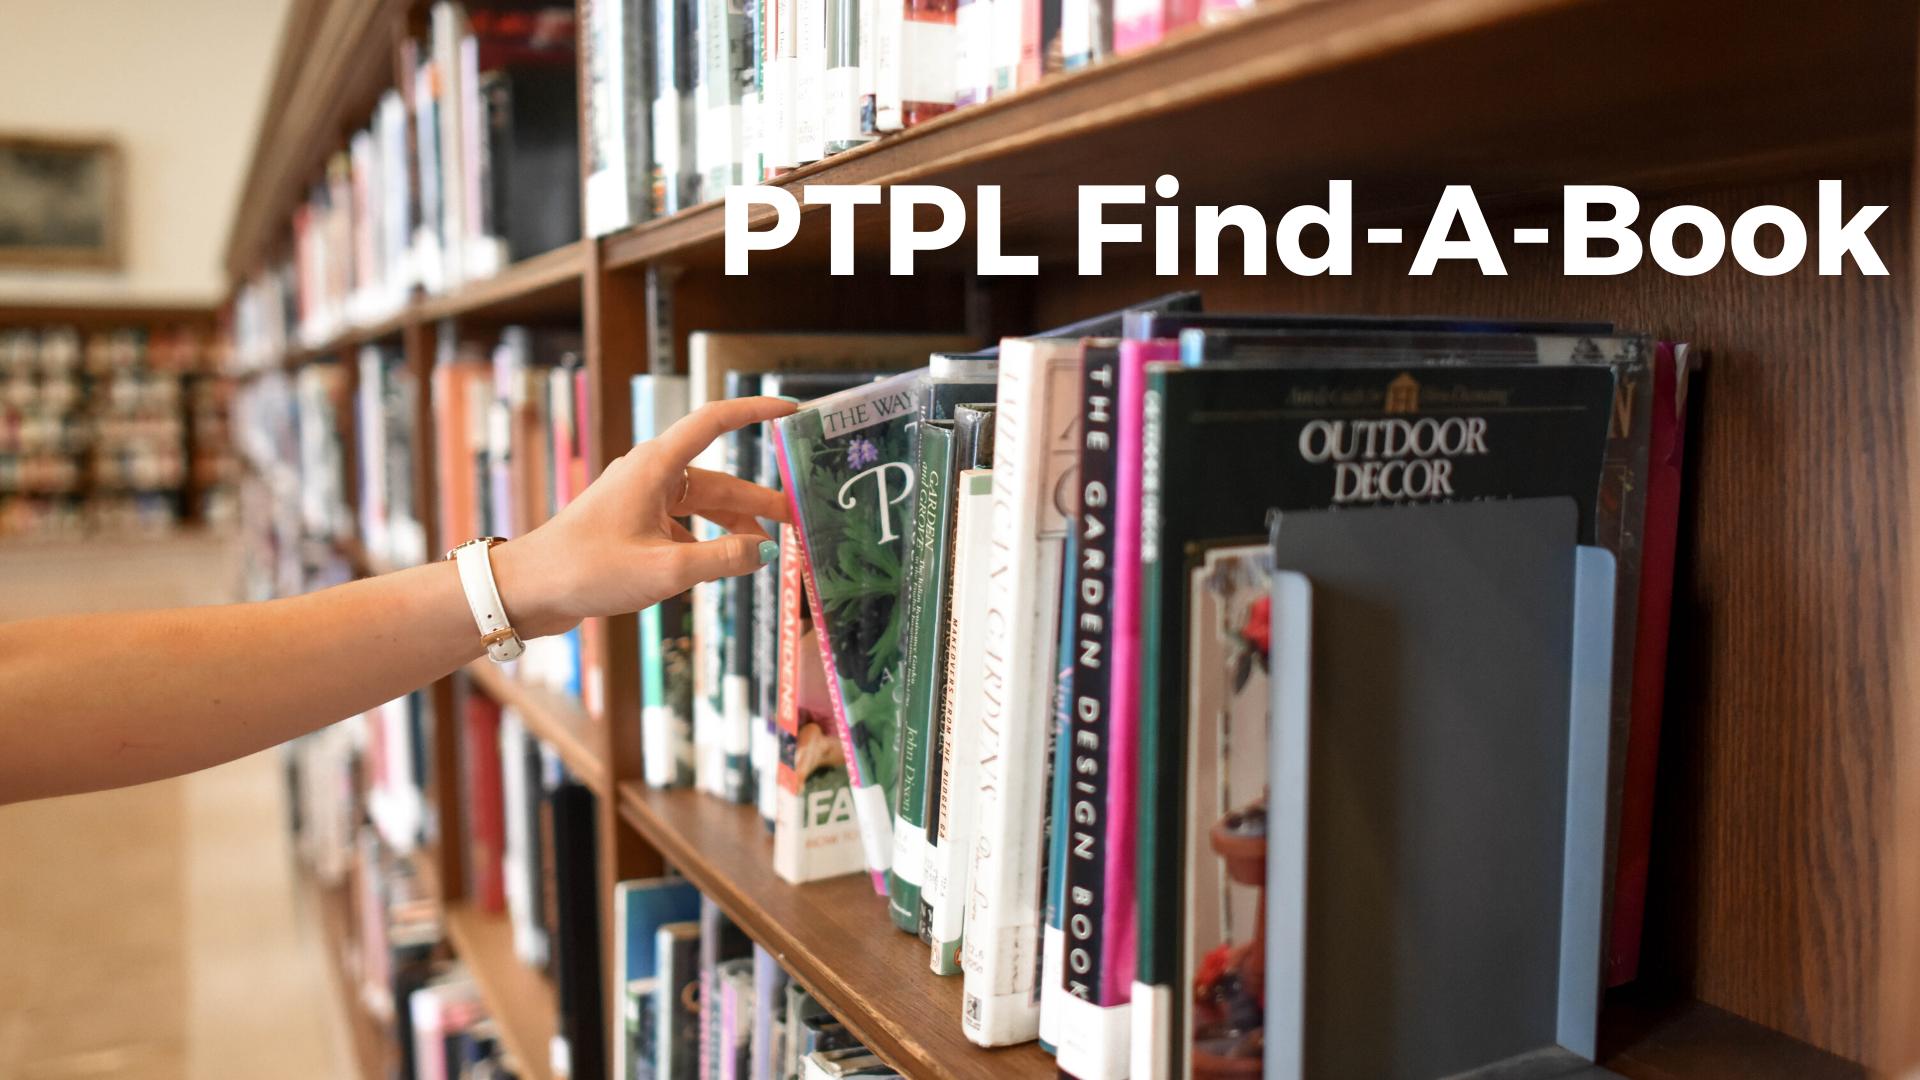 Find-A-Book logos